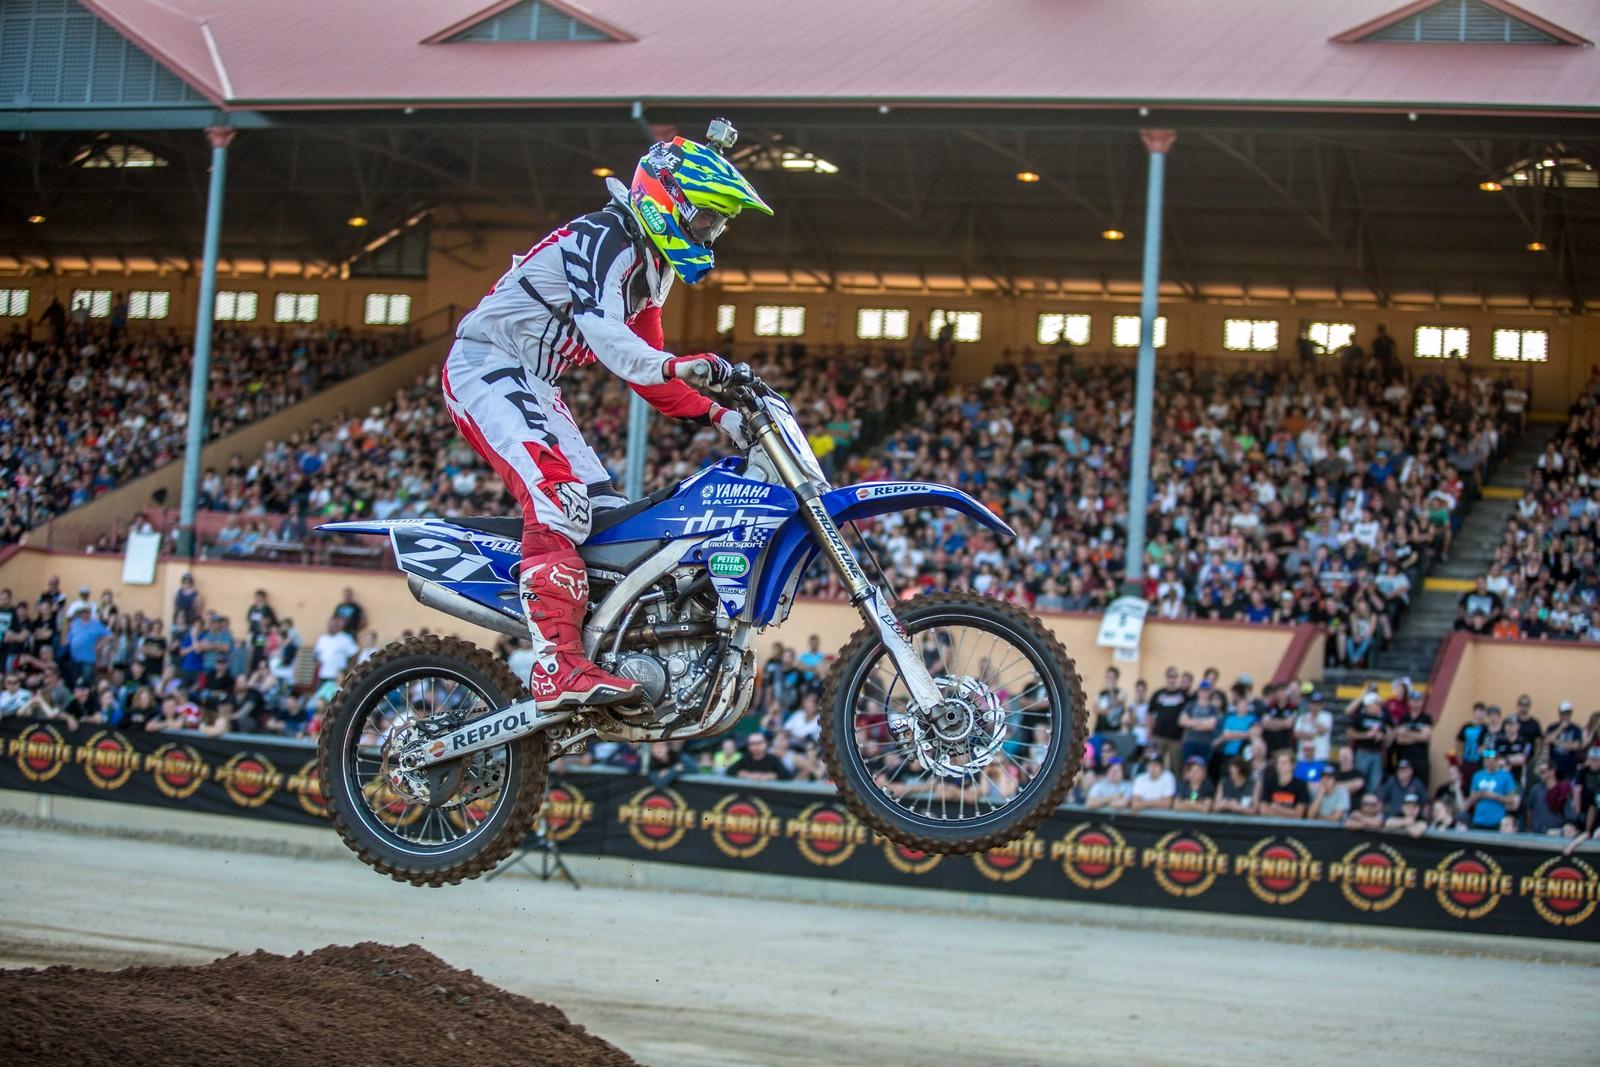 James Brown - Photo Blast: Australian Supercross Championship from Adelaide - Motocross Pictures - Vital MX